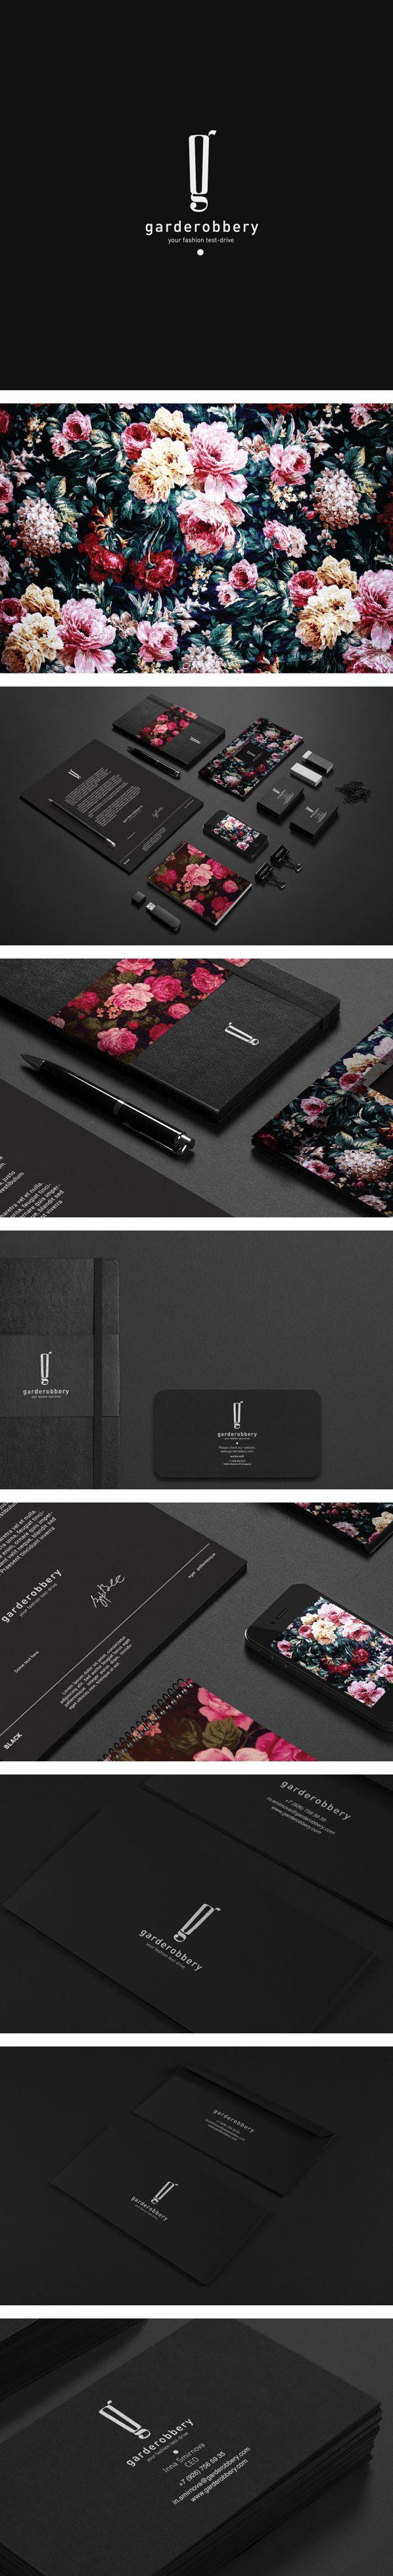 Garderobbery | #stationary #corporate #design #corporatedesign #identity #branding #marketing < repinned by www.BlickeDeeler.de | Take a look at www.LogoGestaltung-Hamburg.de